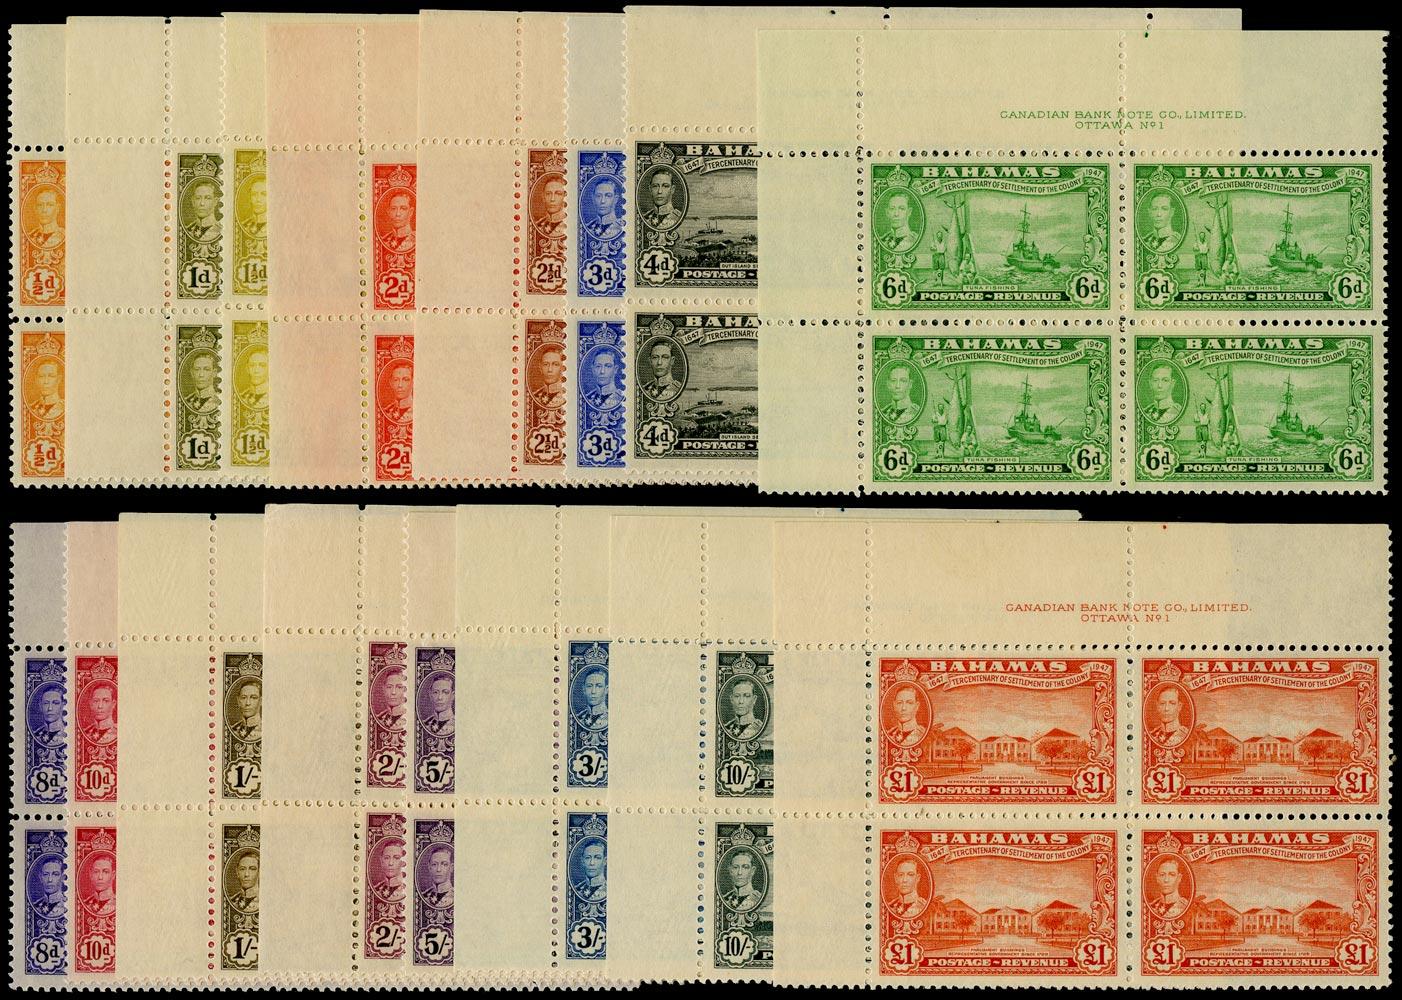 BAHAMAS 1948  SG178/93 Mint unmounted KGVI Eleuthera set of 16 to £1 imprint blocks